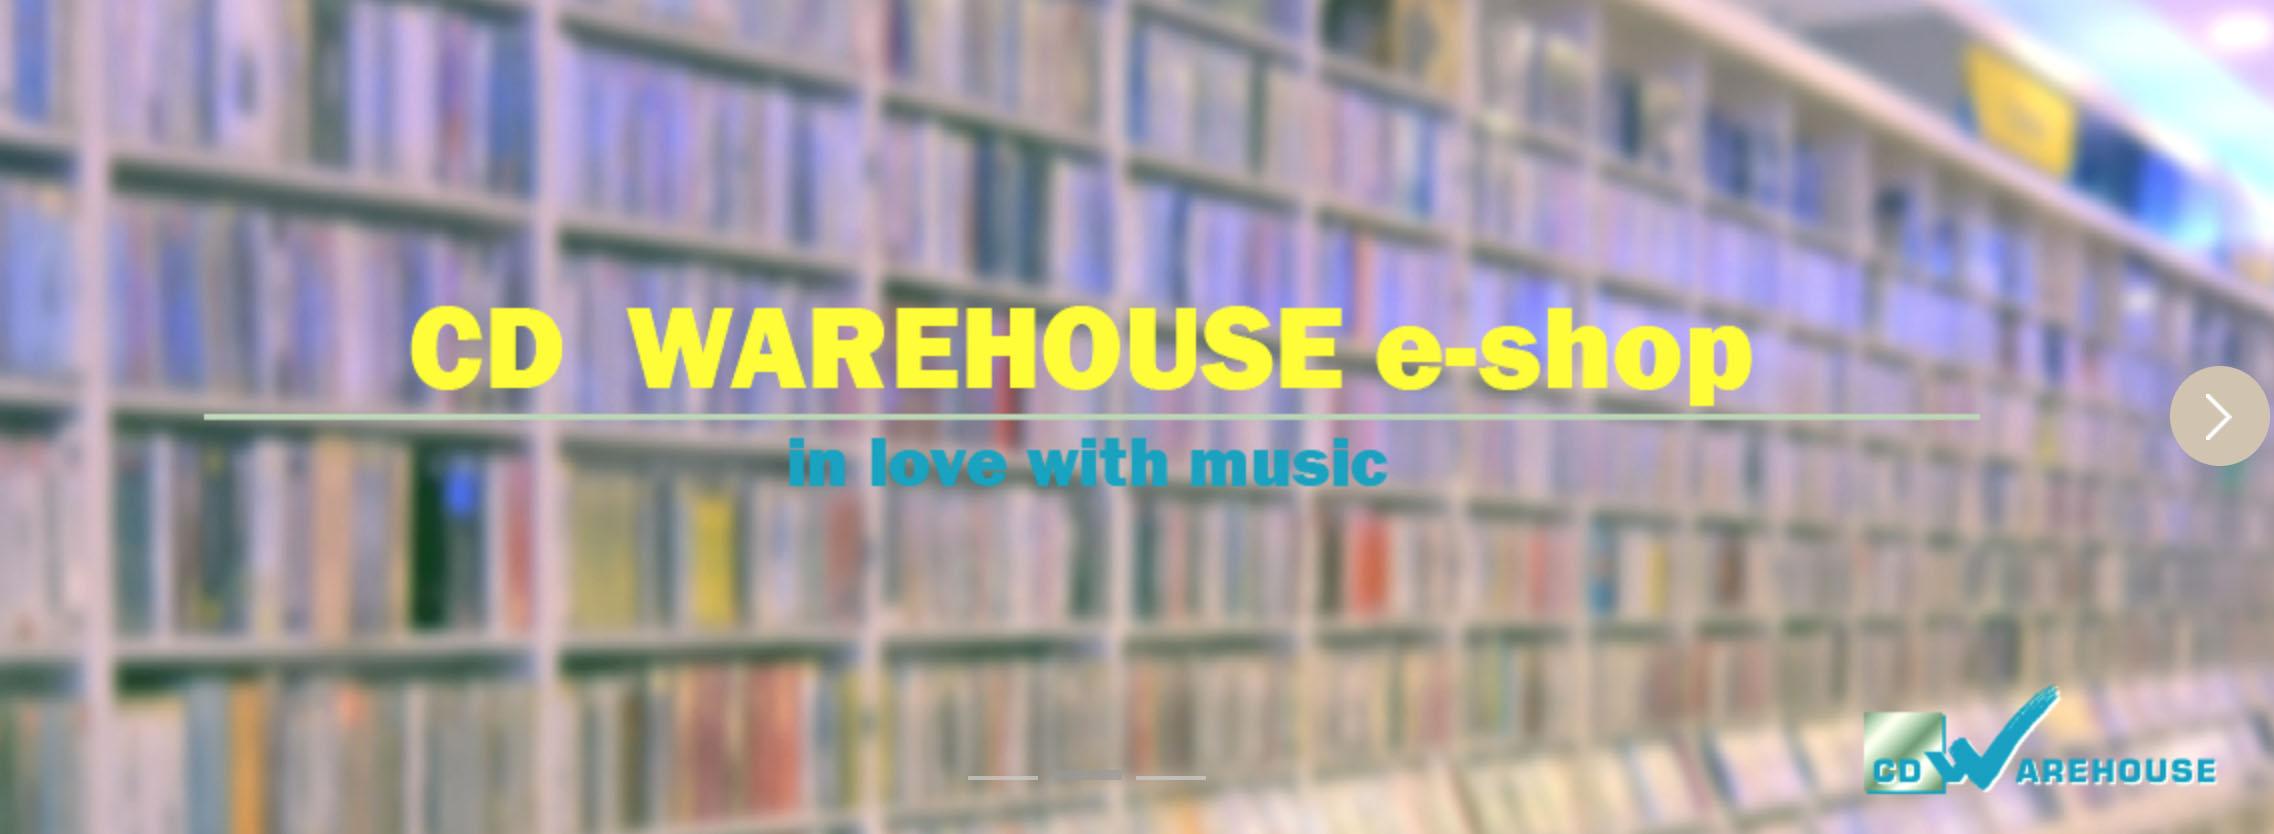 CD Warehouse